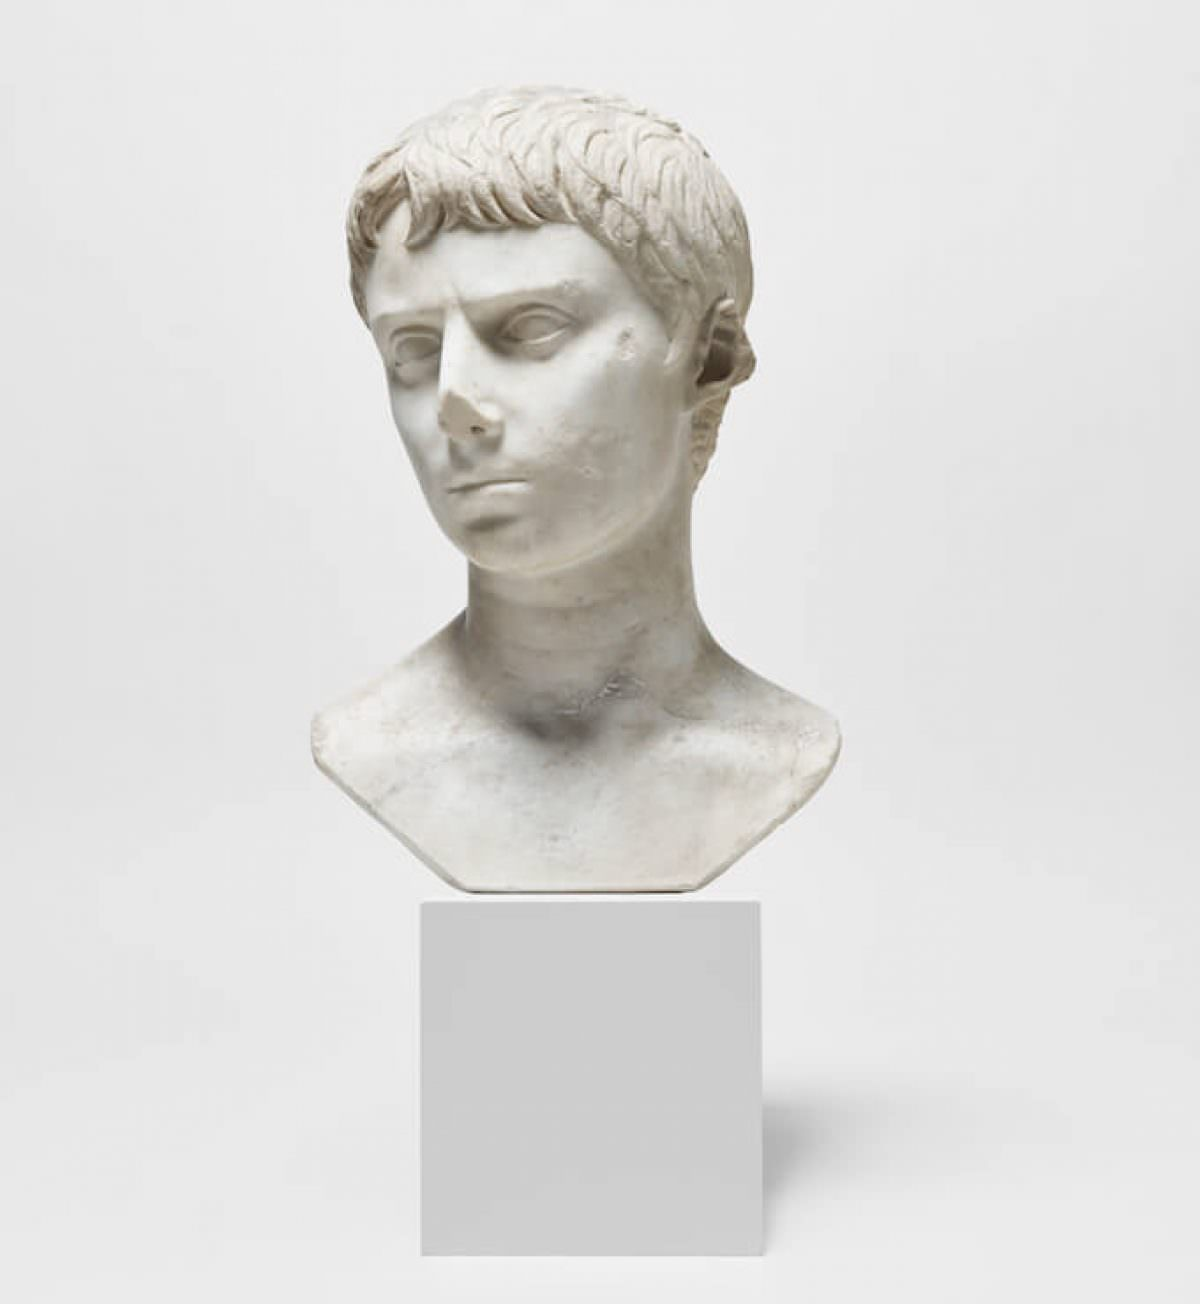 Lucio Cesare, Museo Archeologico di Aquileia